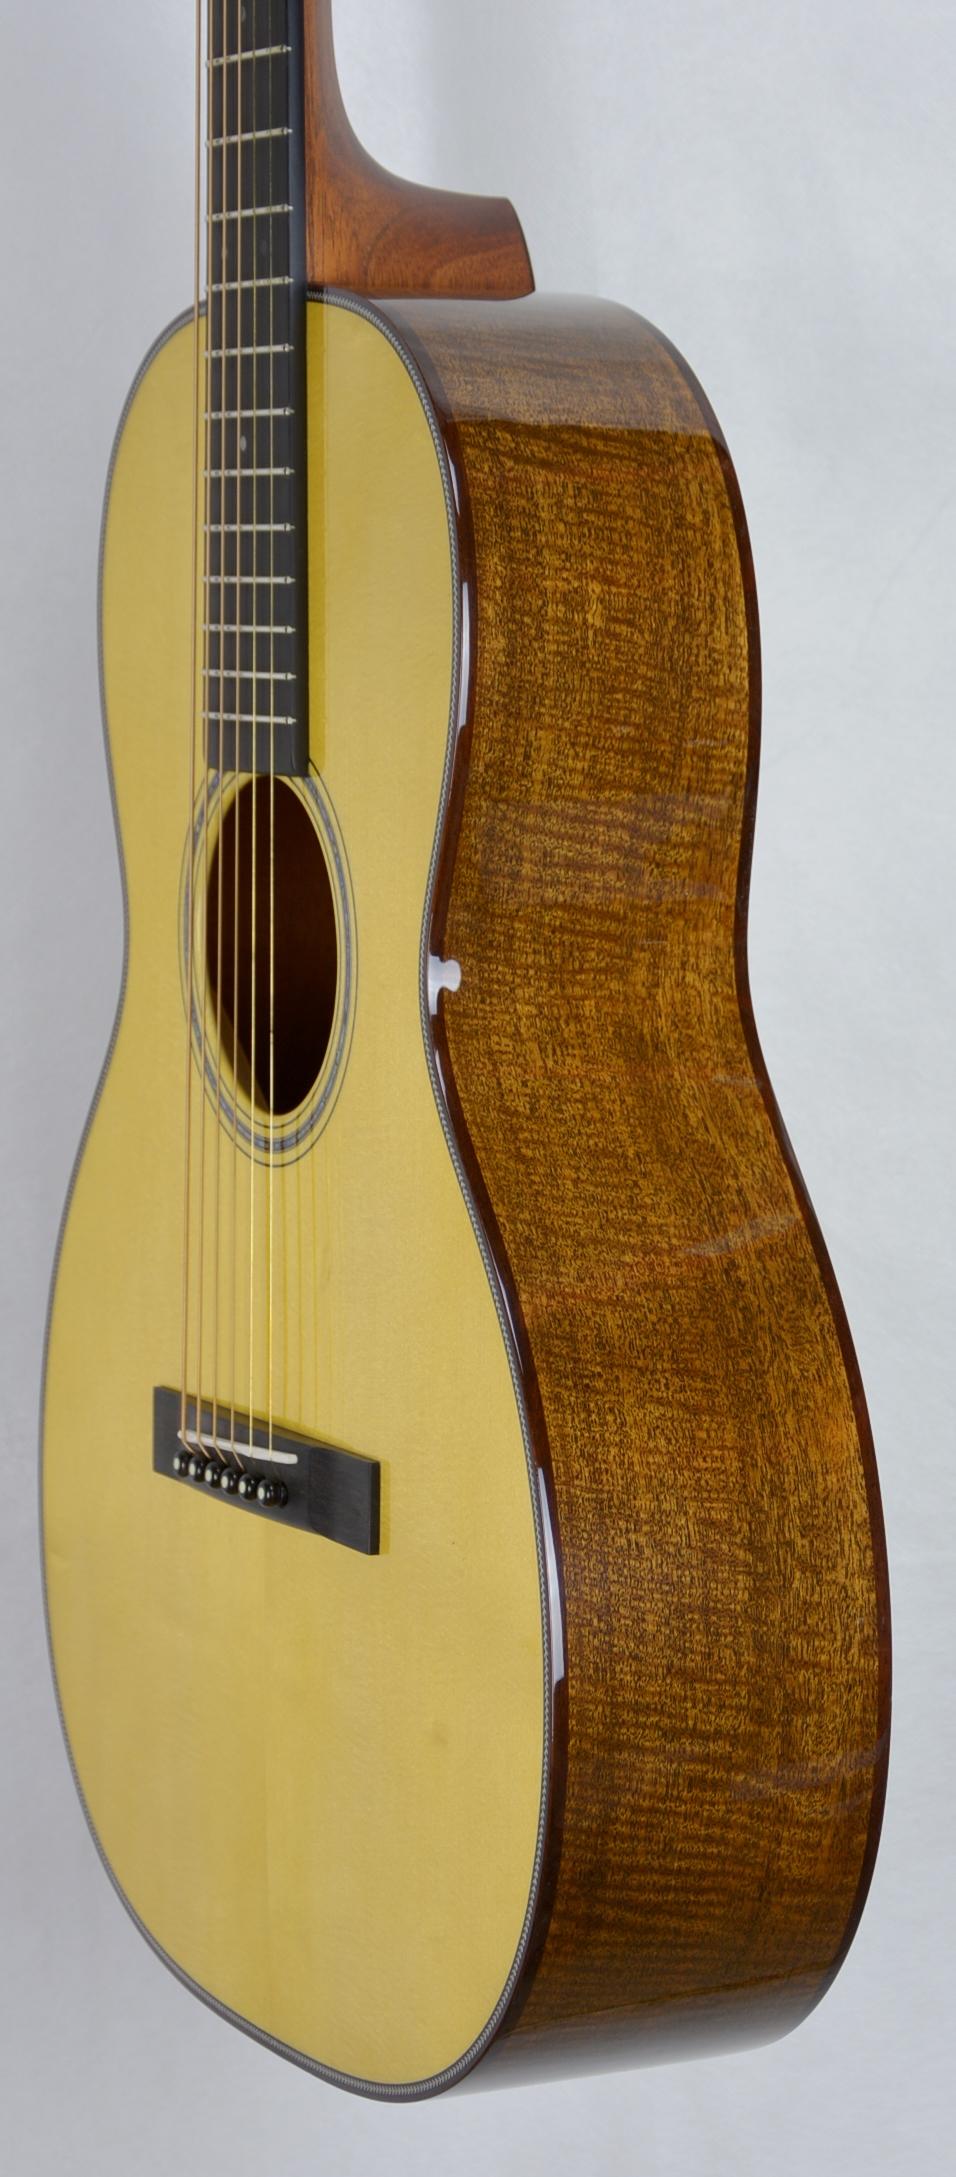 Q-2396024 S-1827233 00-12 Fiddleback Alpine Fine HB (3).JPG